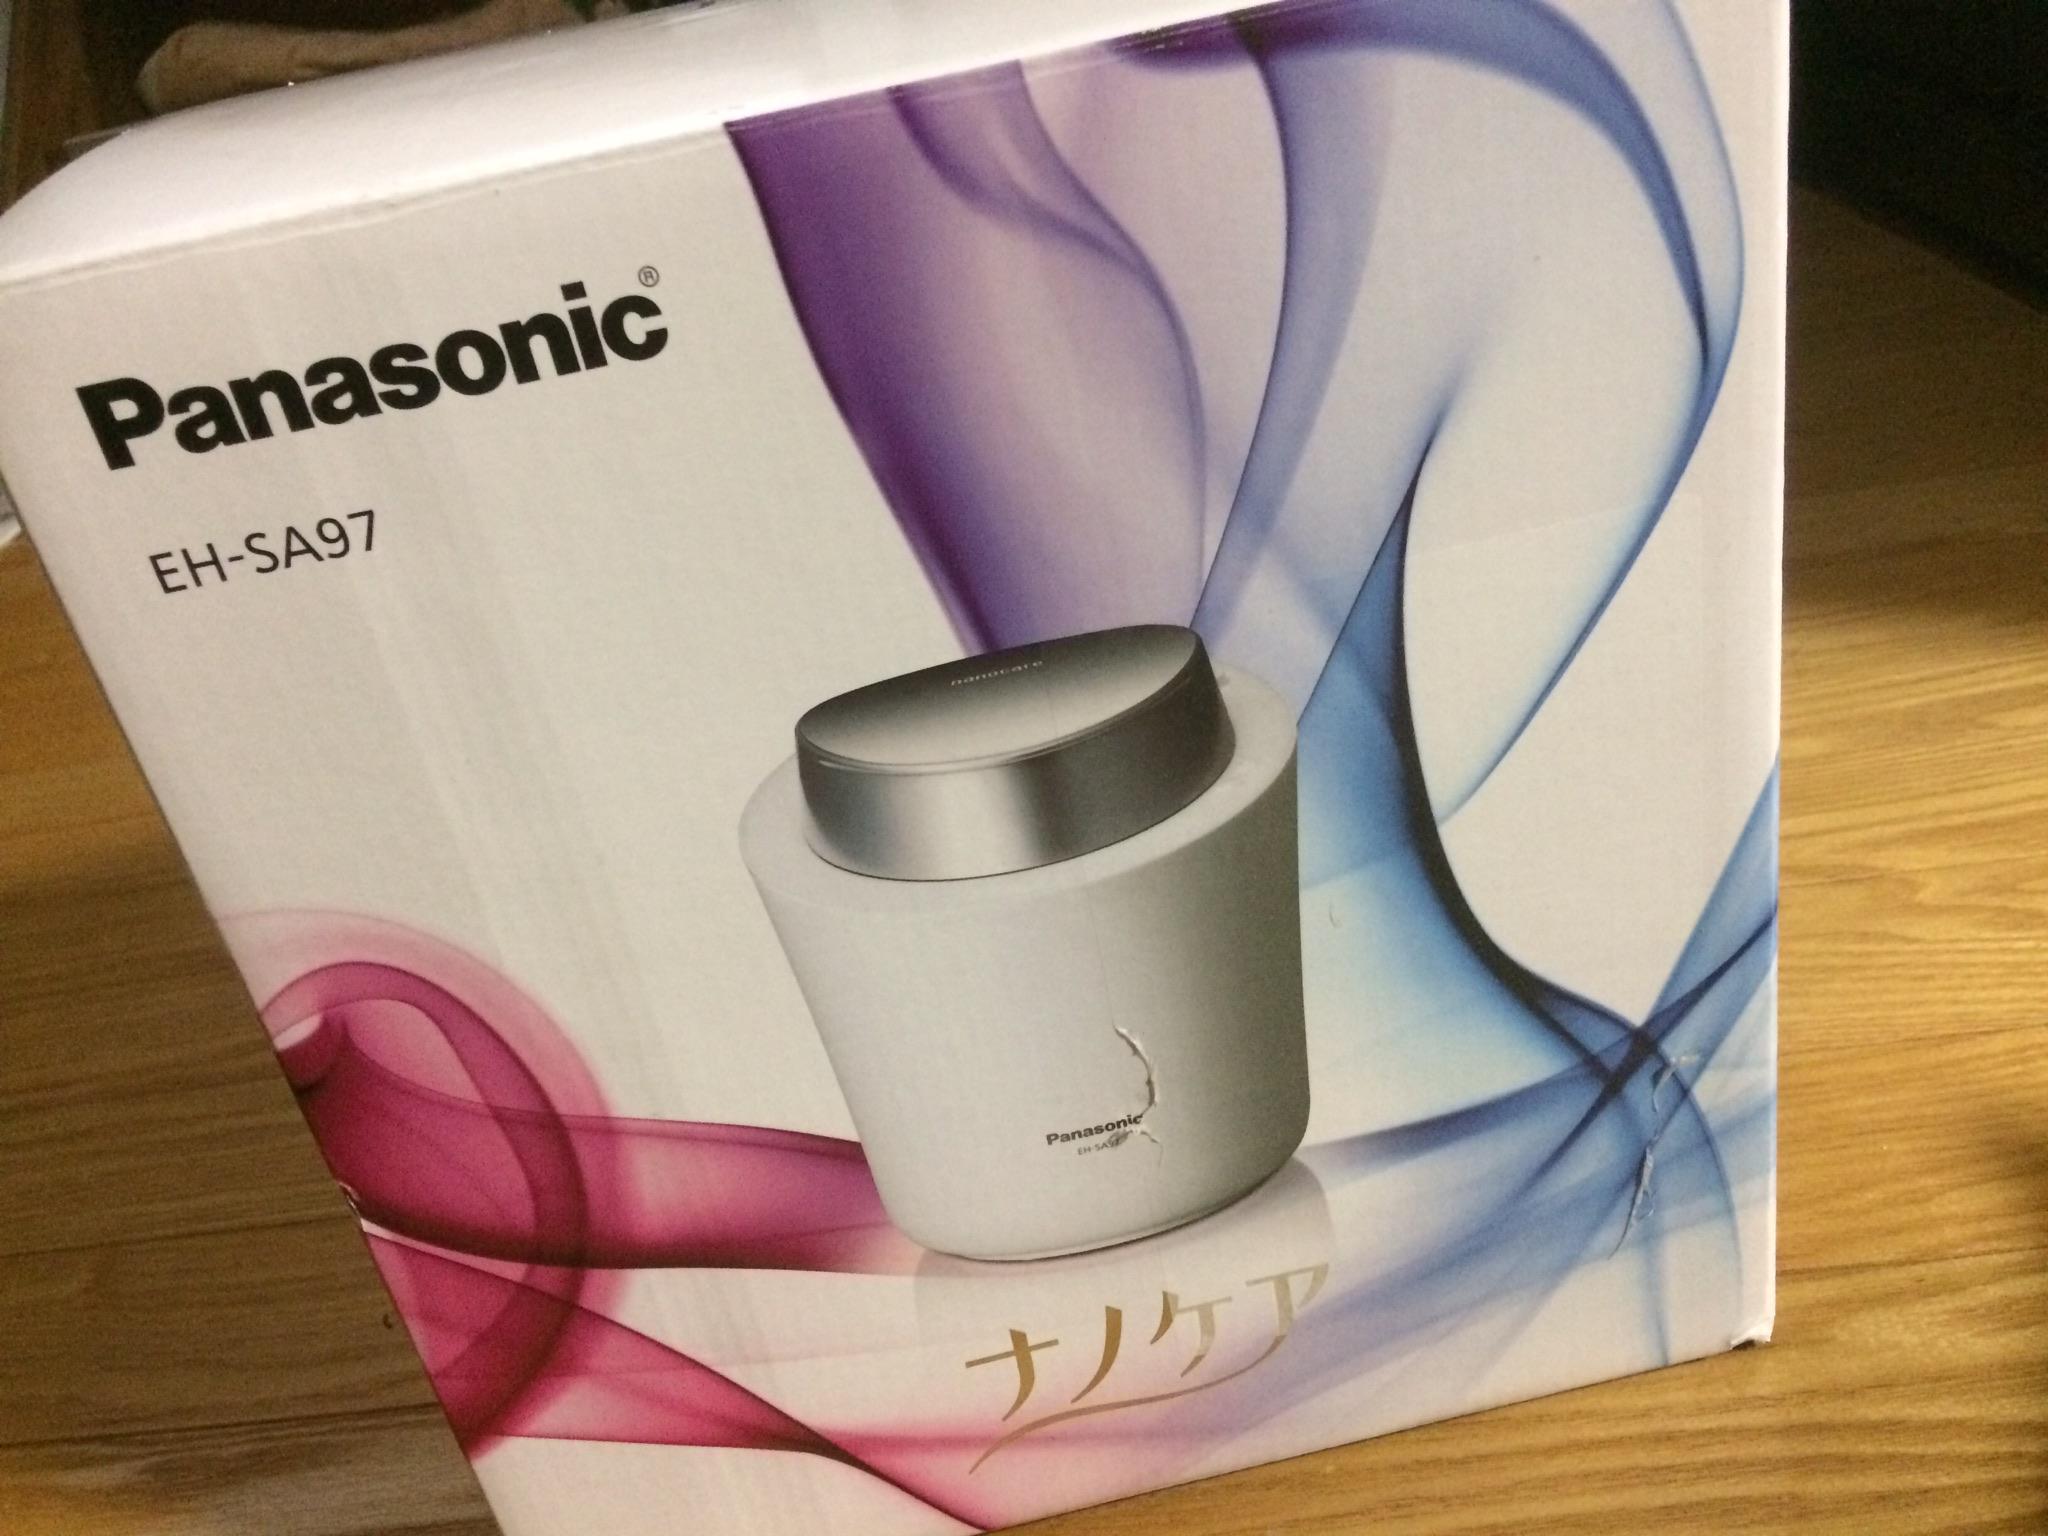 Panasonicの美容器具を買った